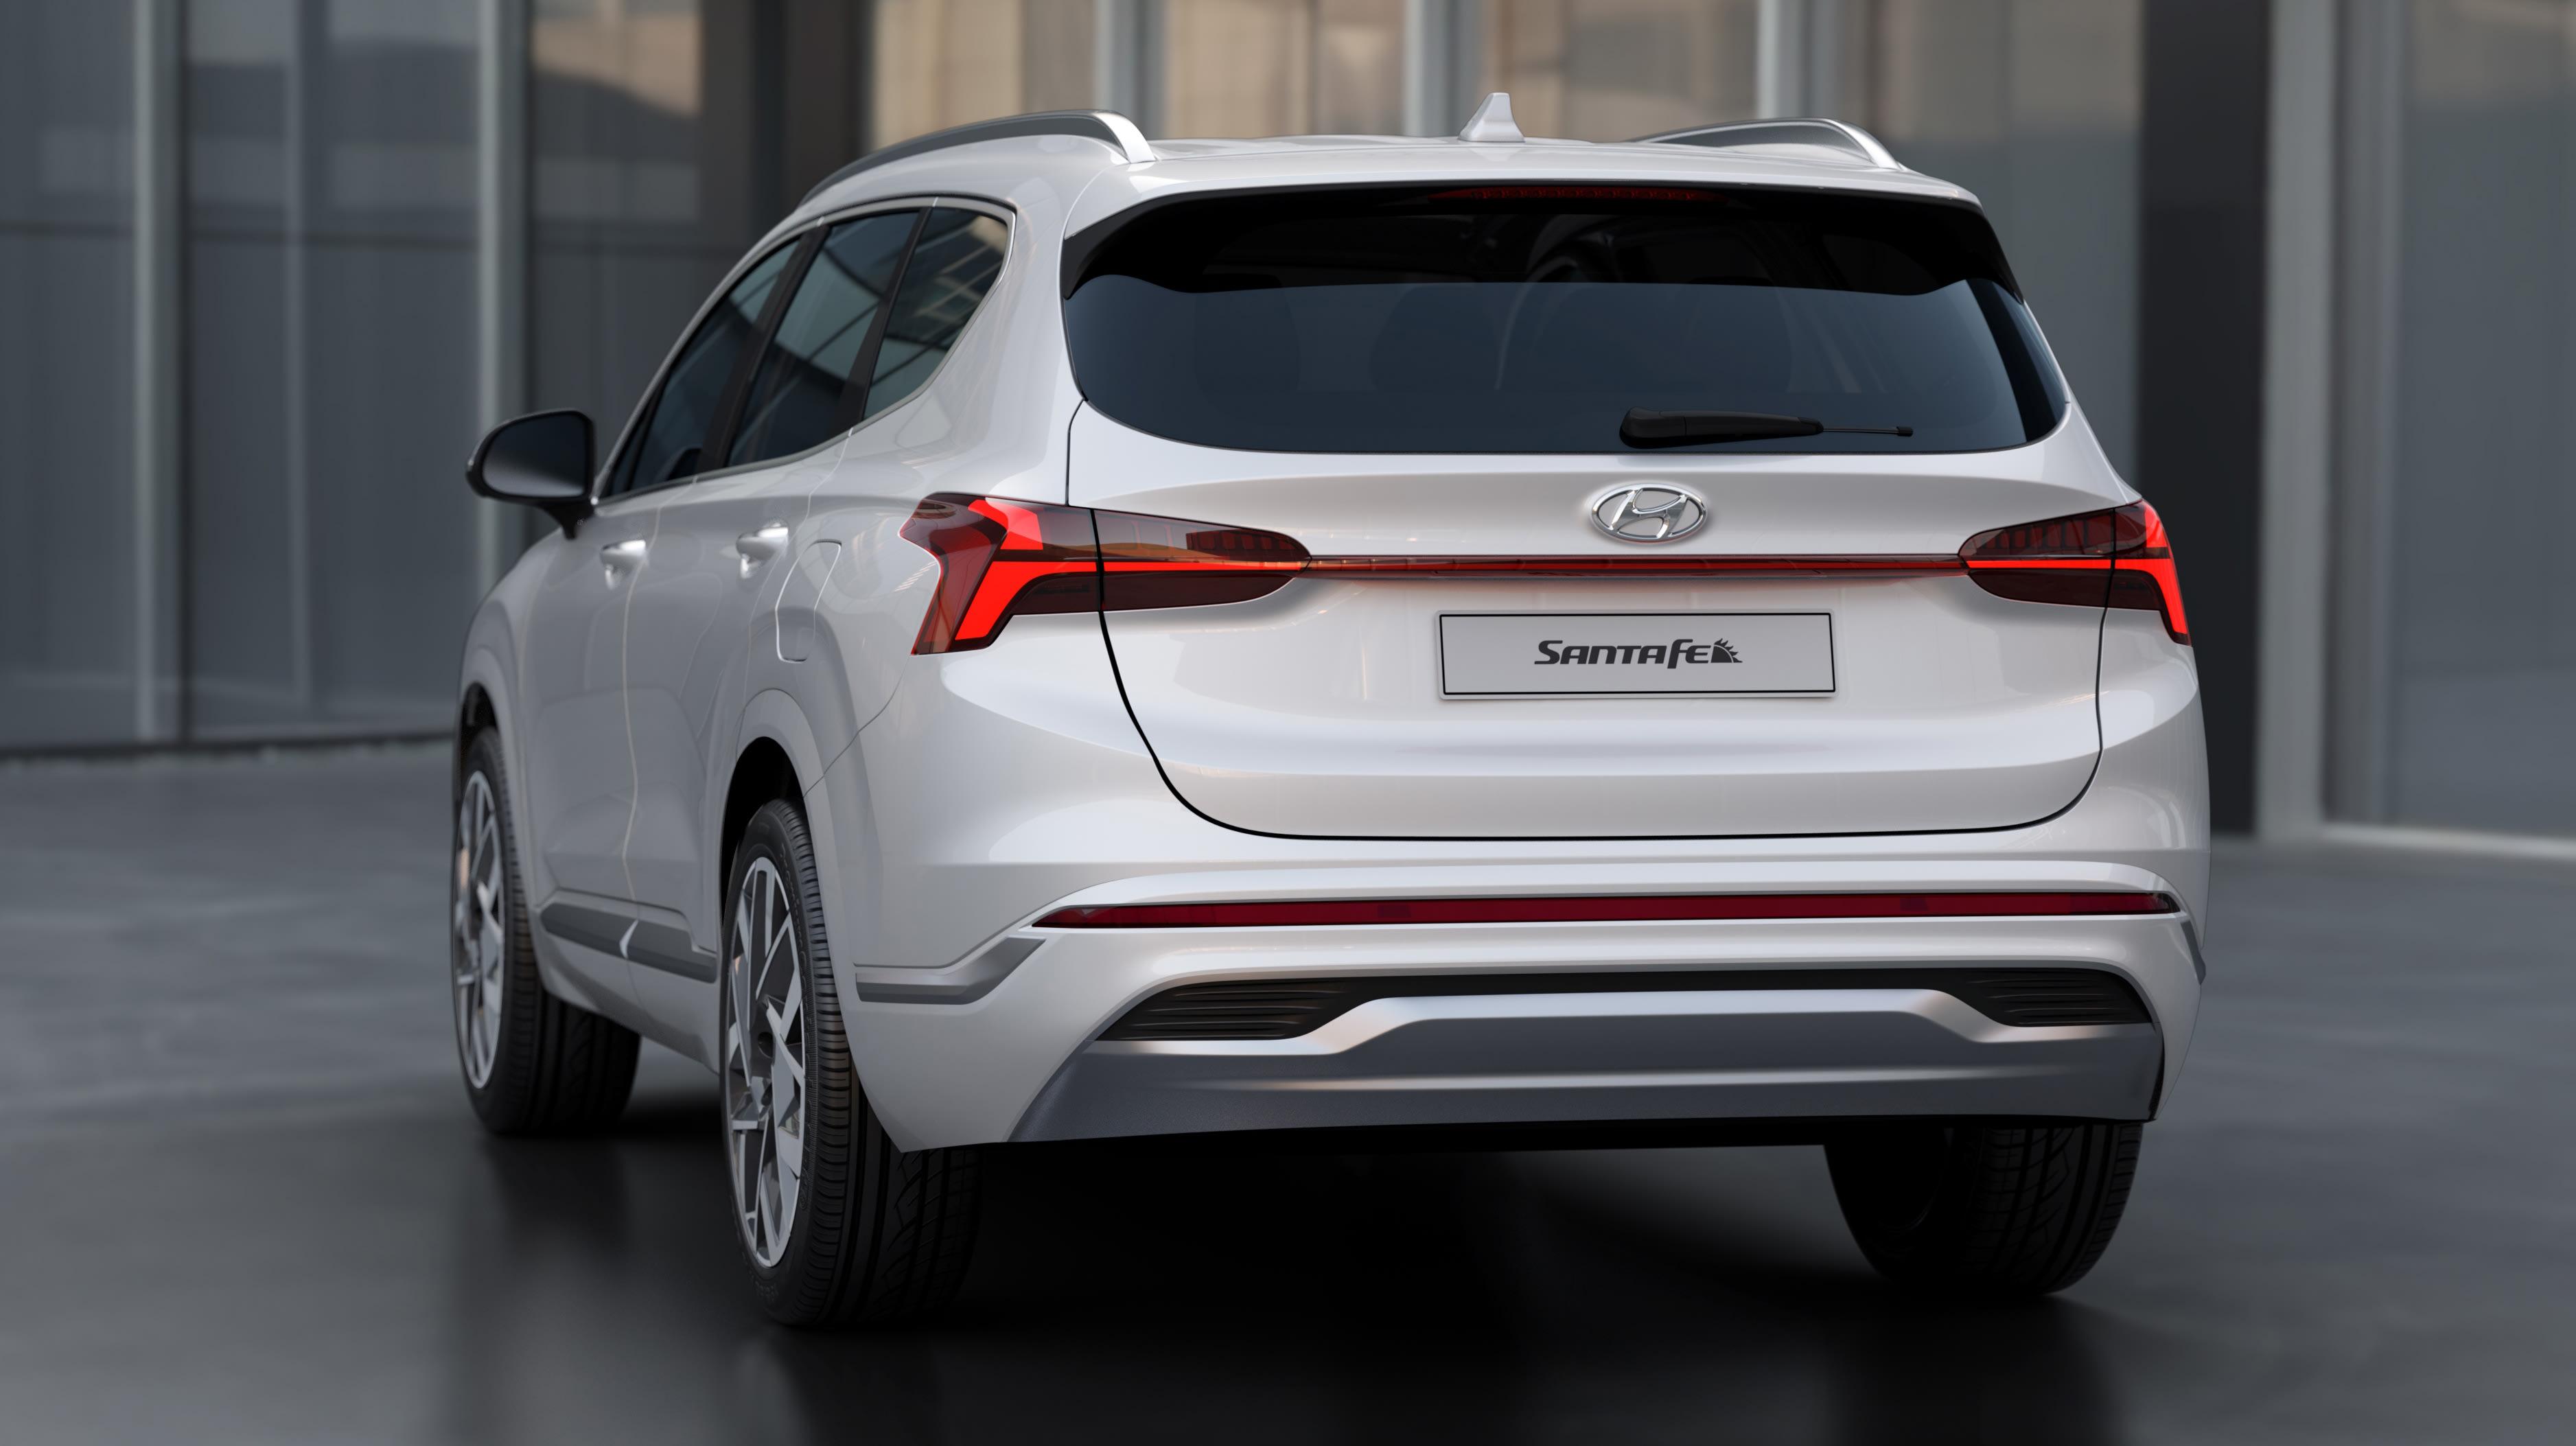 2021 Hyundai Veracruz New Concept